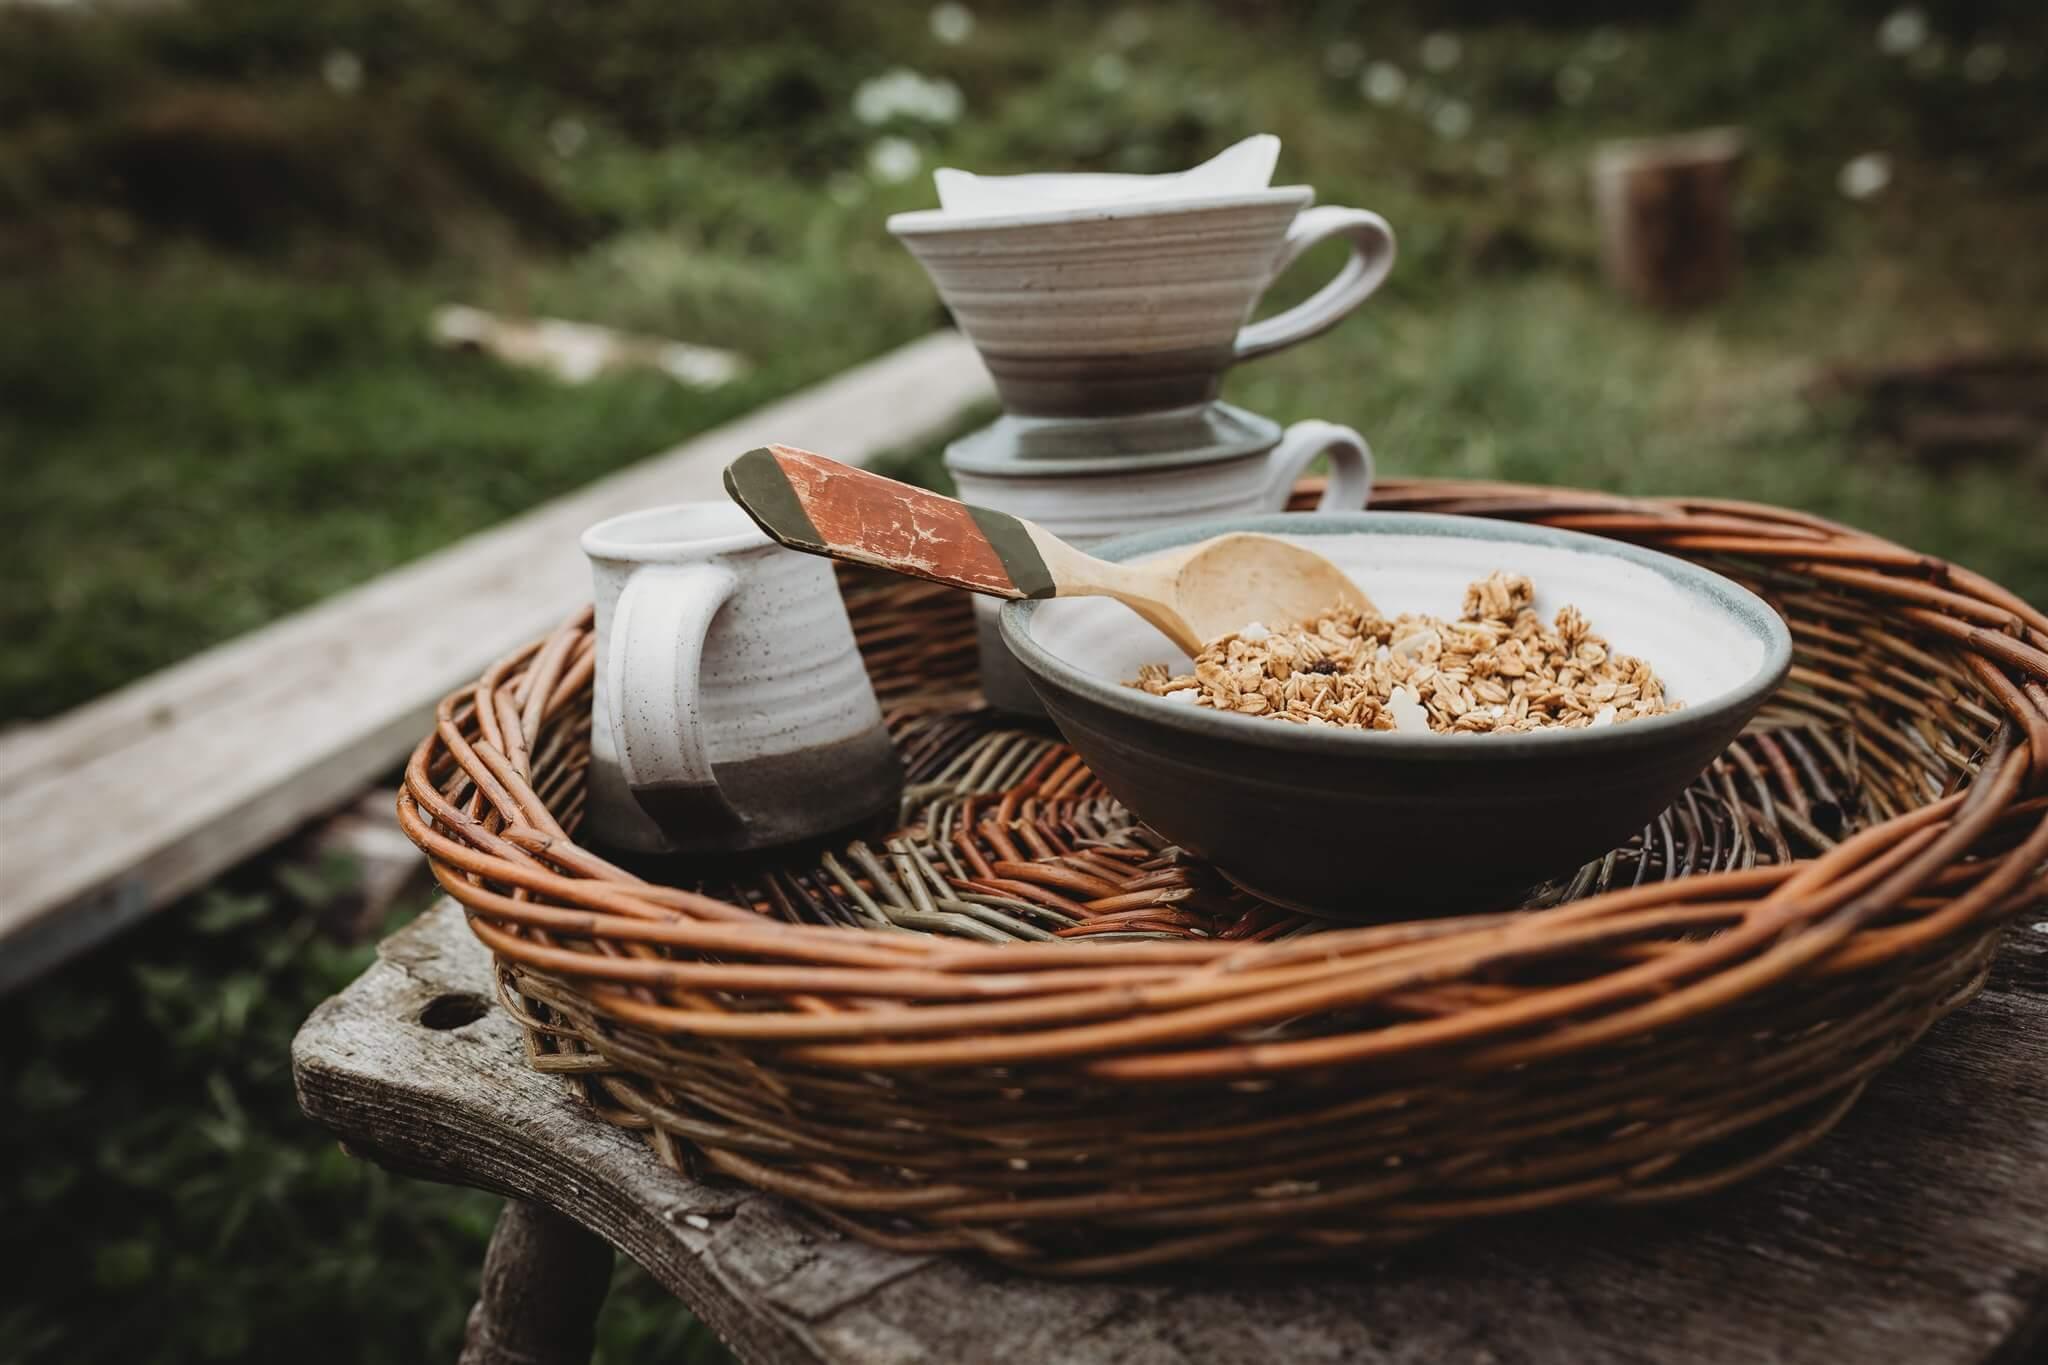 willow tray lifestyle